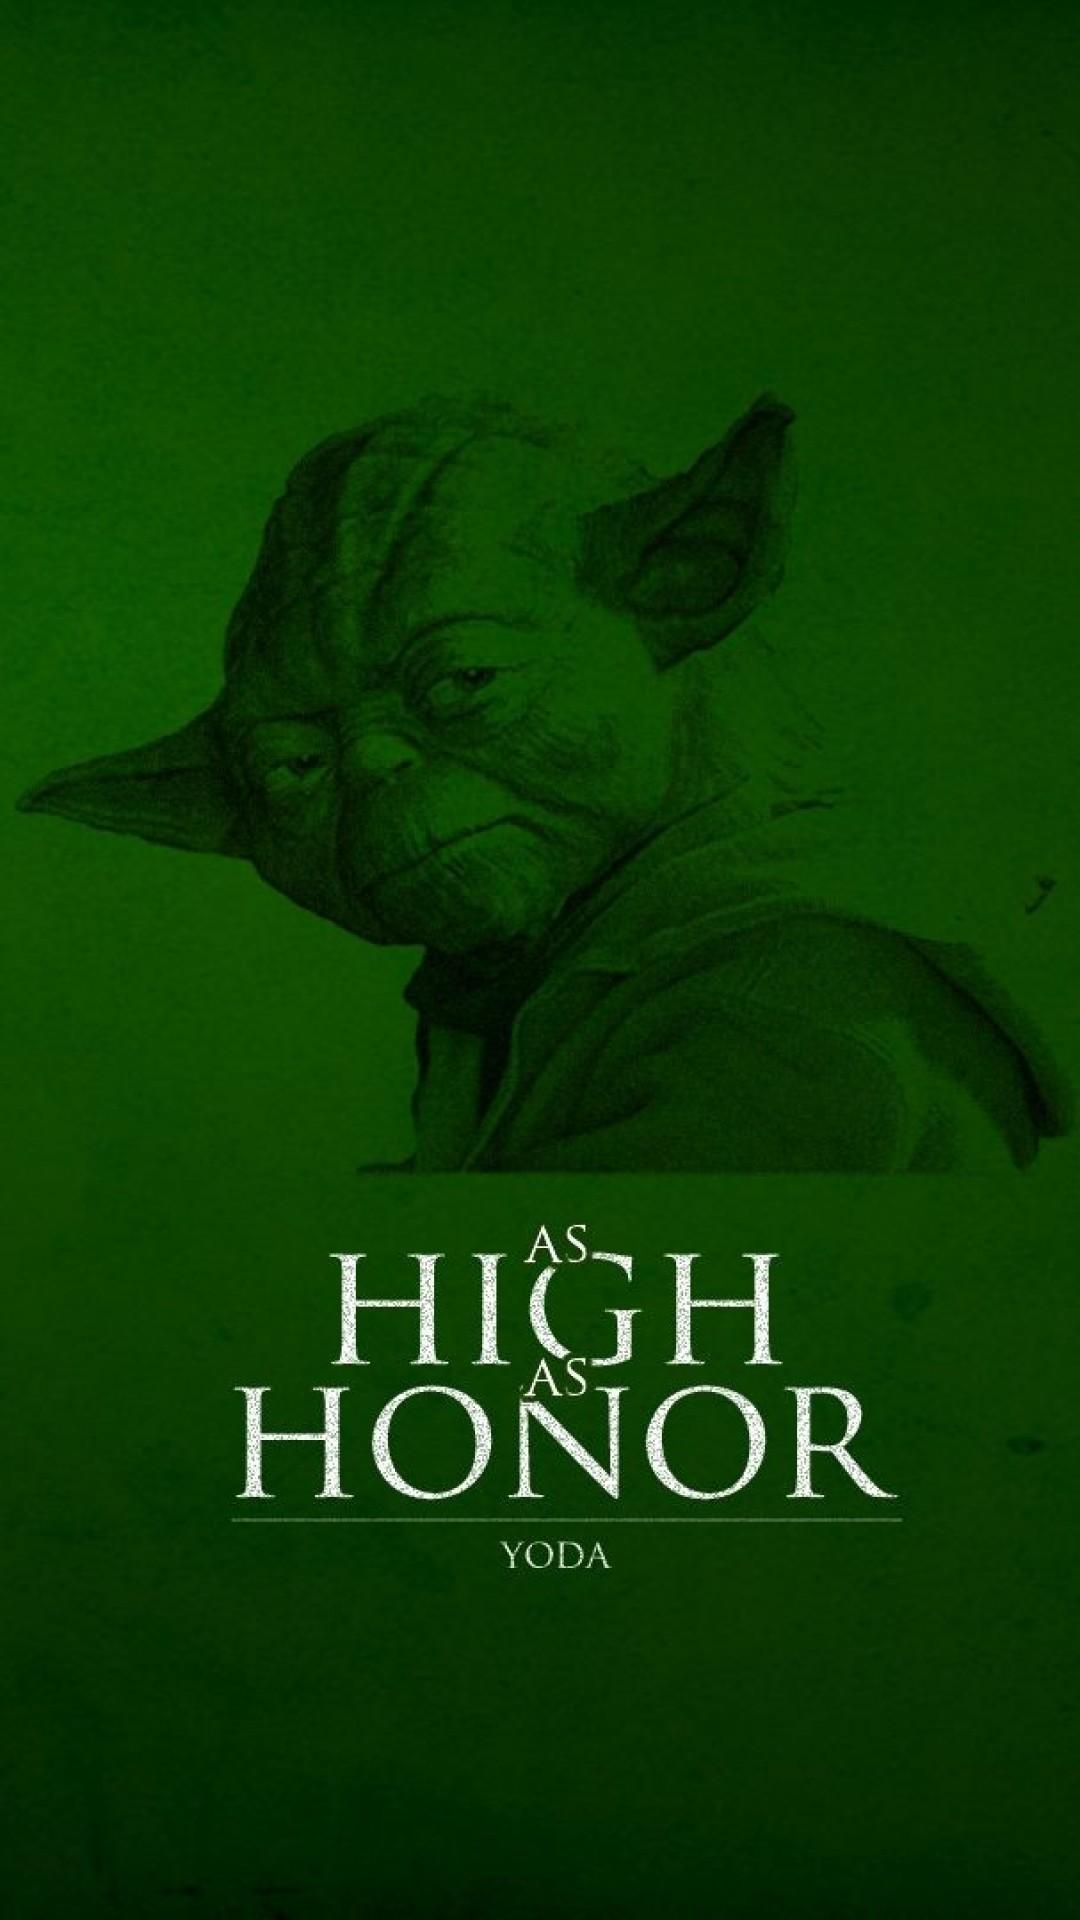 Dumbledore Quote Iphone Wallpaper Yoda Wallpaper 78 Immagini